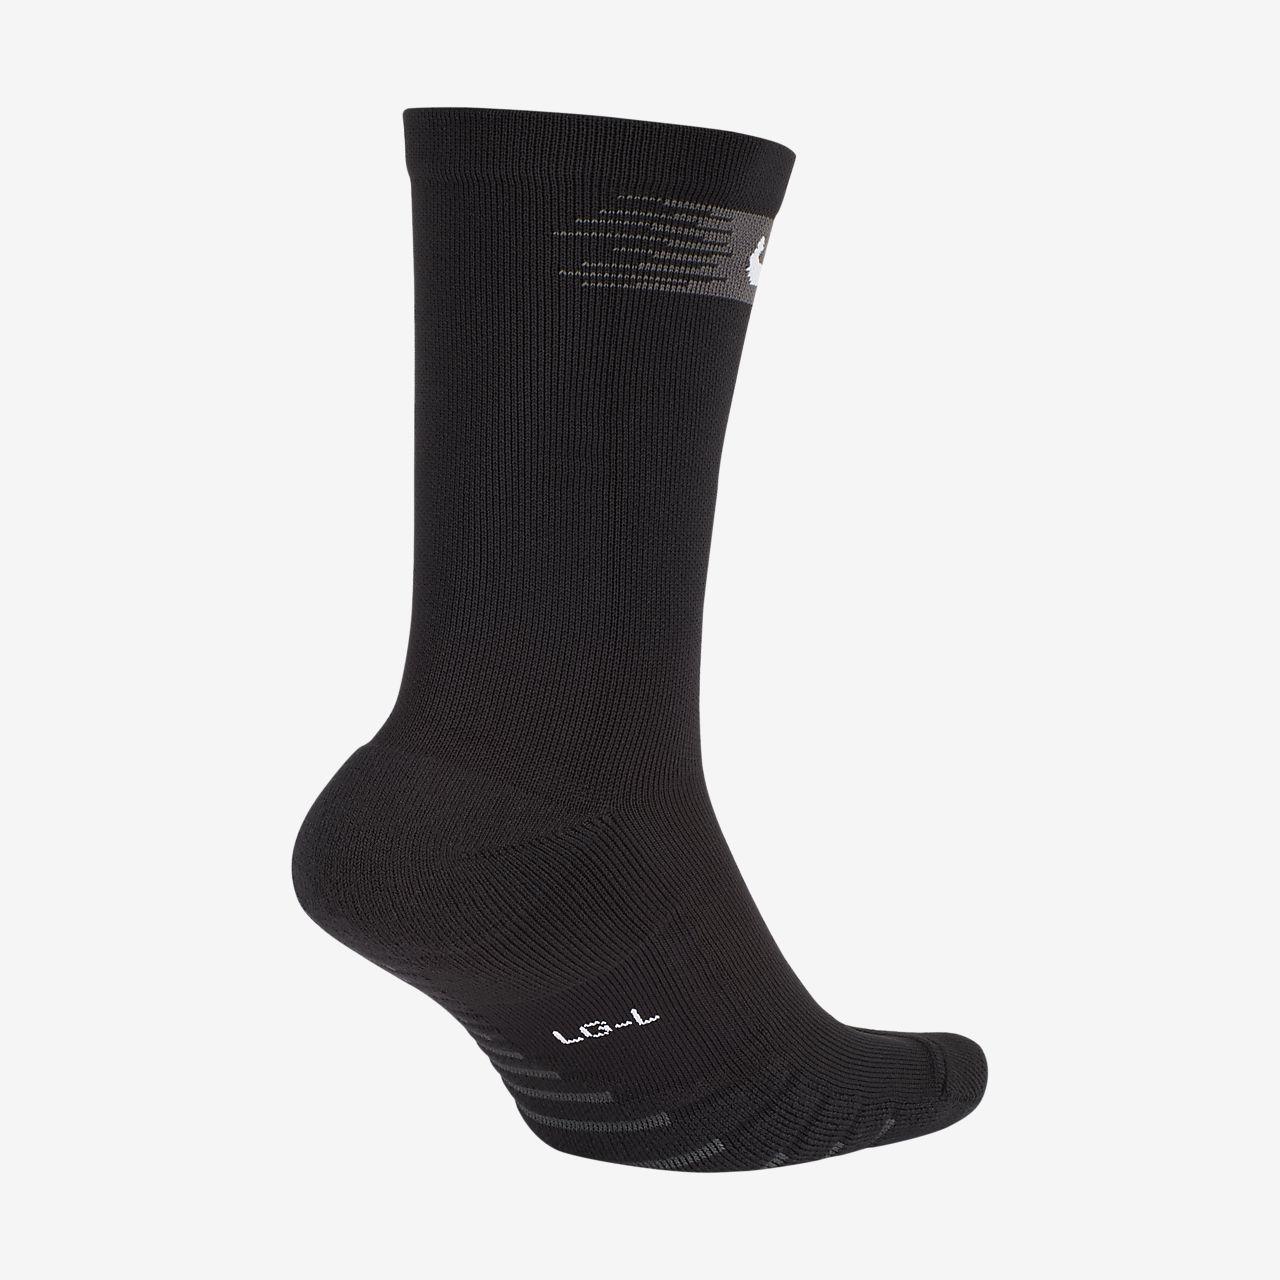 238c6d2a3933 Nike Squad Crew Soccer Socks. Nike.com